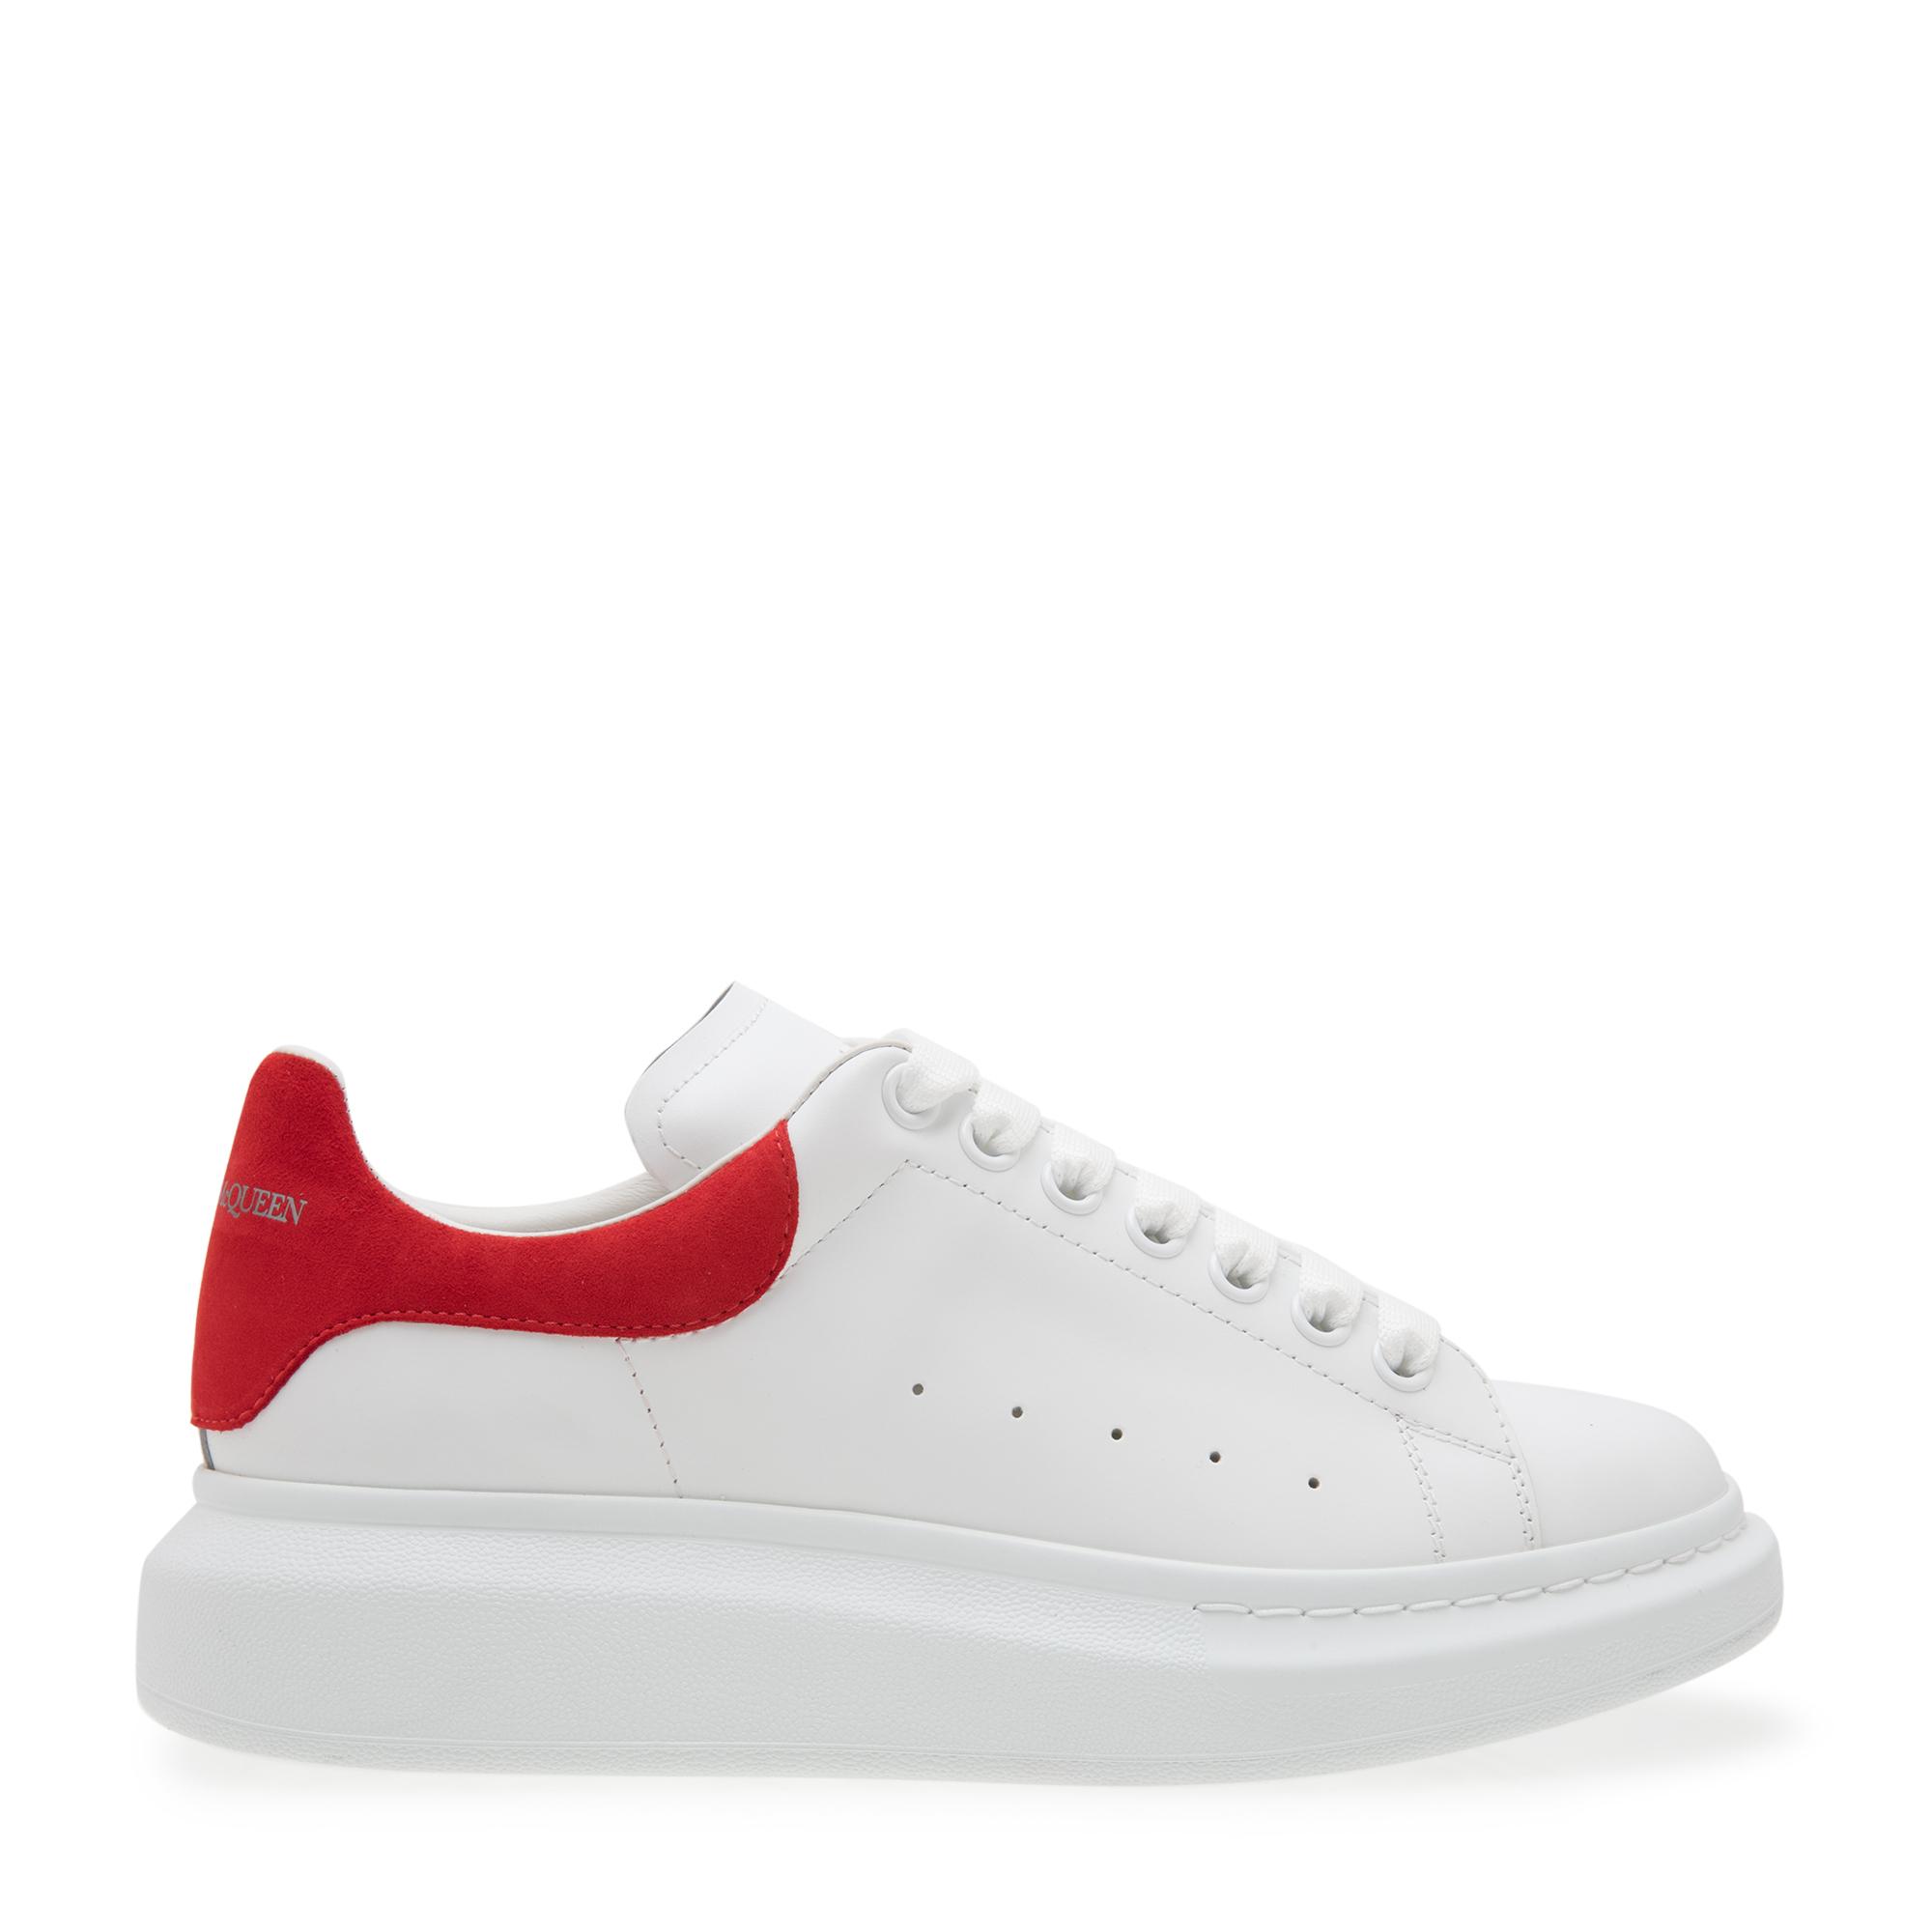 Larry oversized sneakers